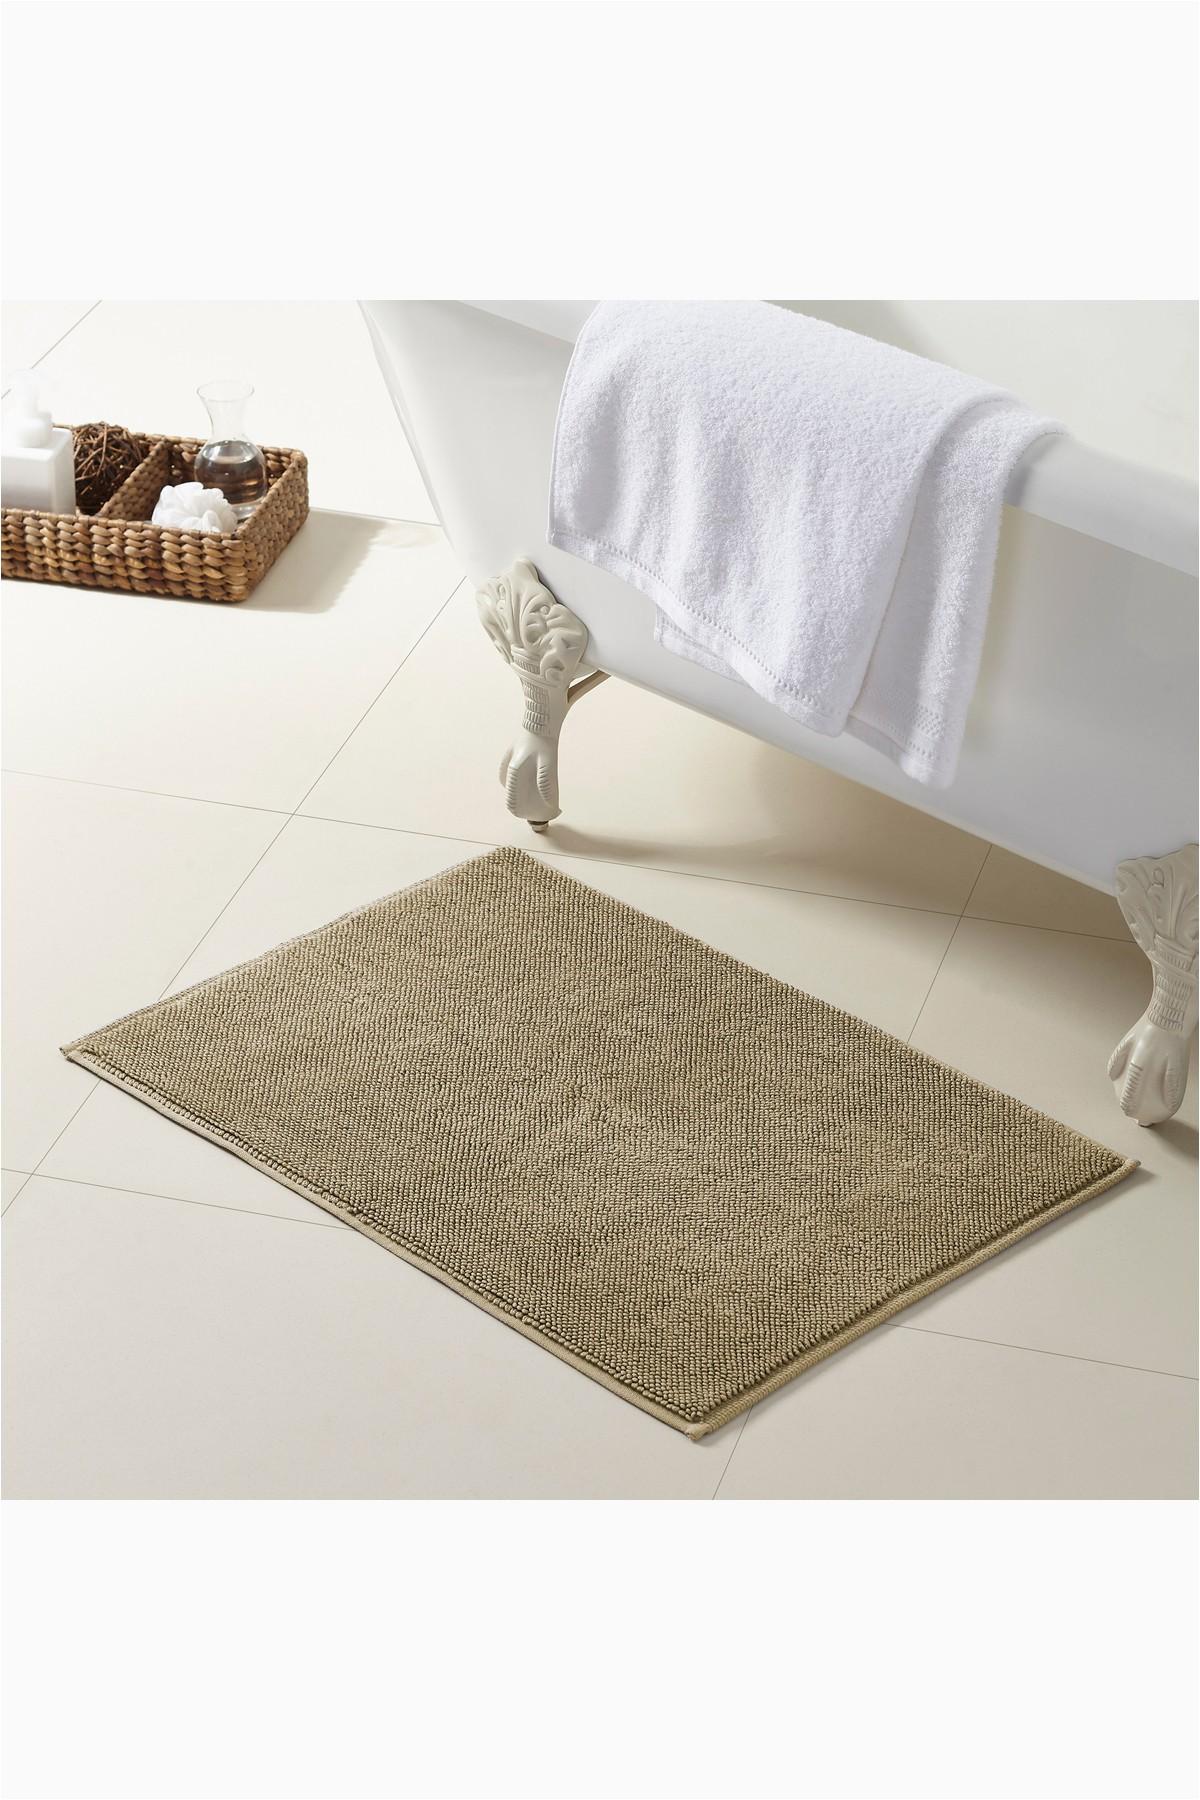 Turkish Cotton Bath Rugs Modern Threads Turkish Cotton Reversible Bath Rug Oatmeal